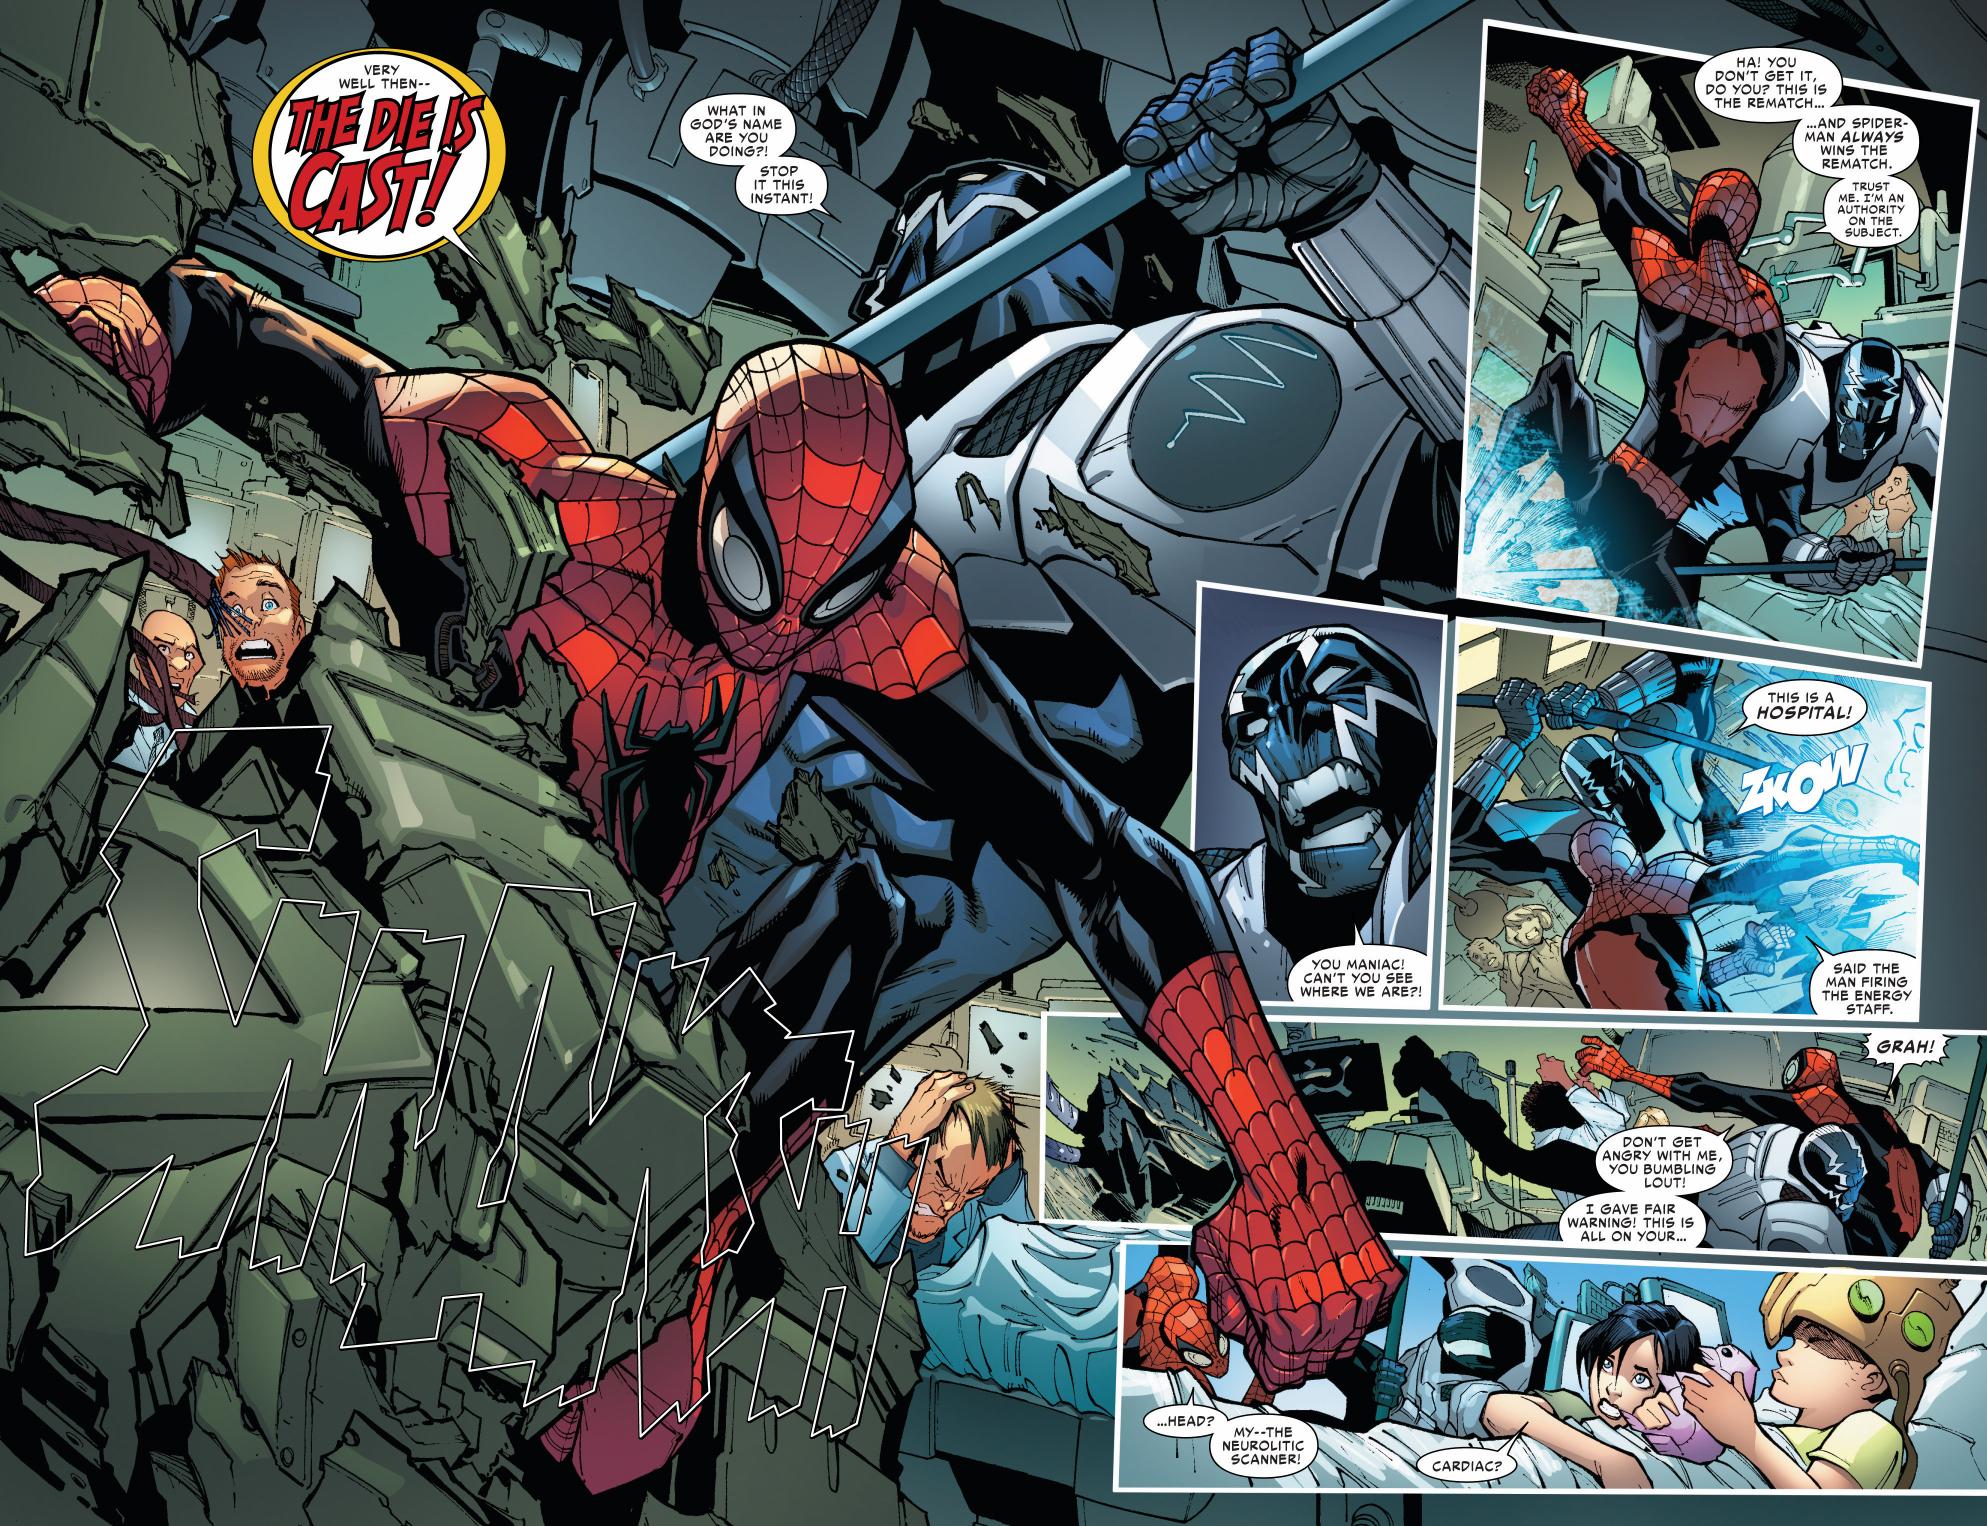 superior spiderman vs cardiac rematch